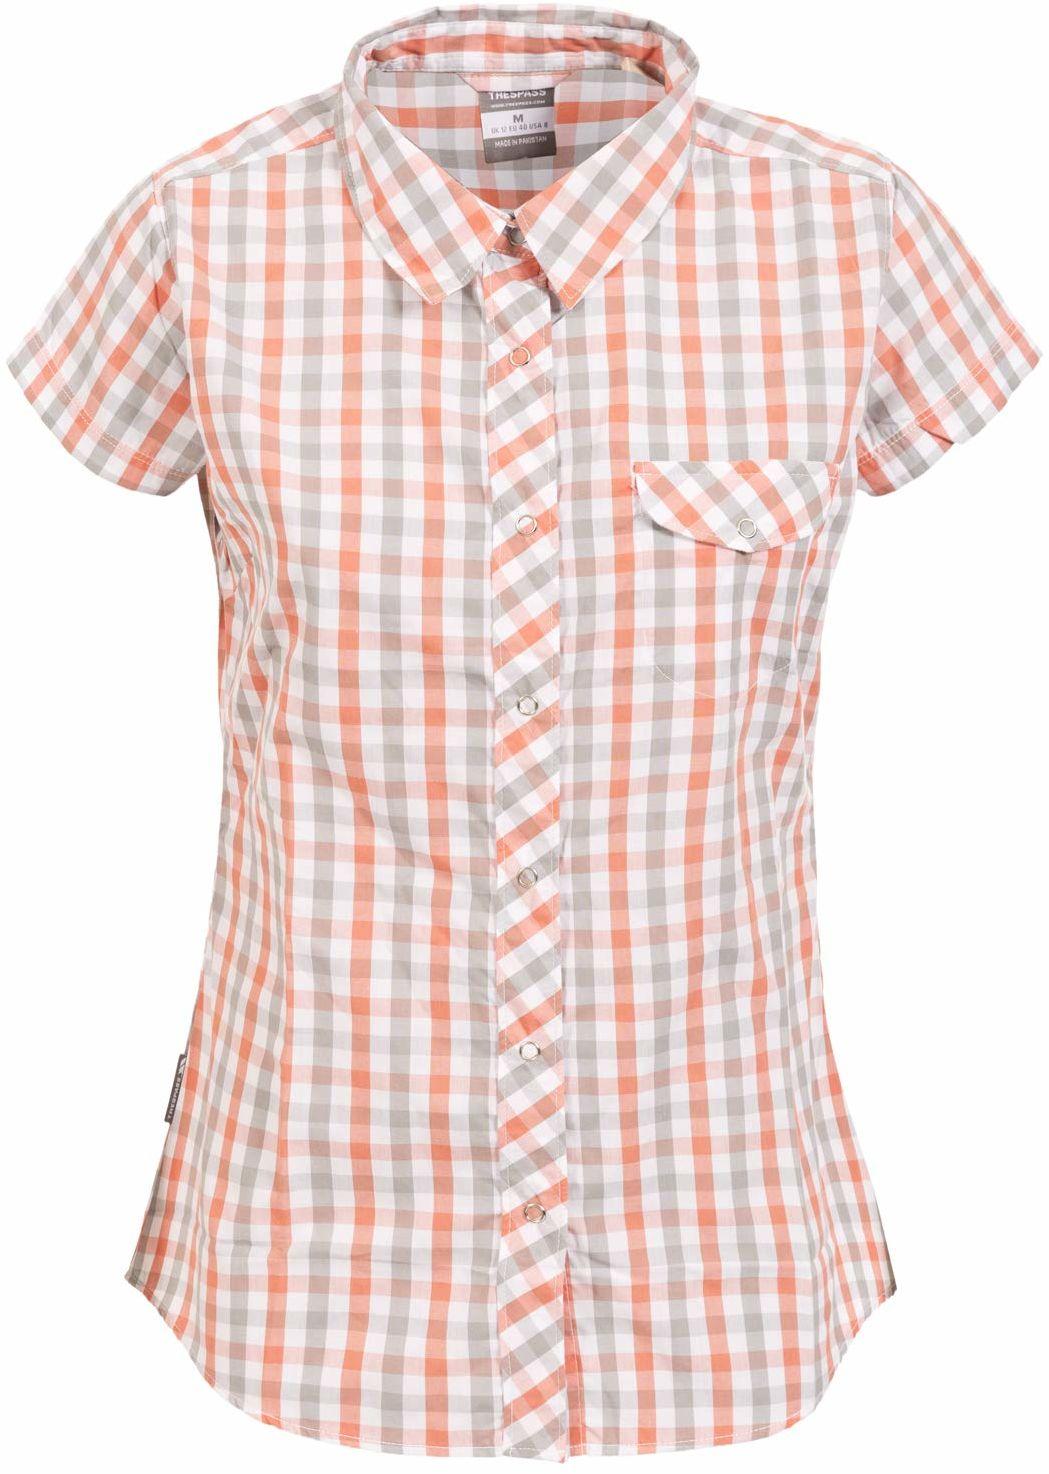 Trespass Tilley damska koszulka z krótkim rękawem Blush Check XS